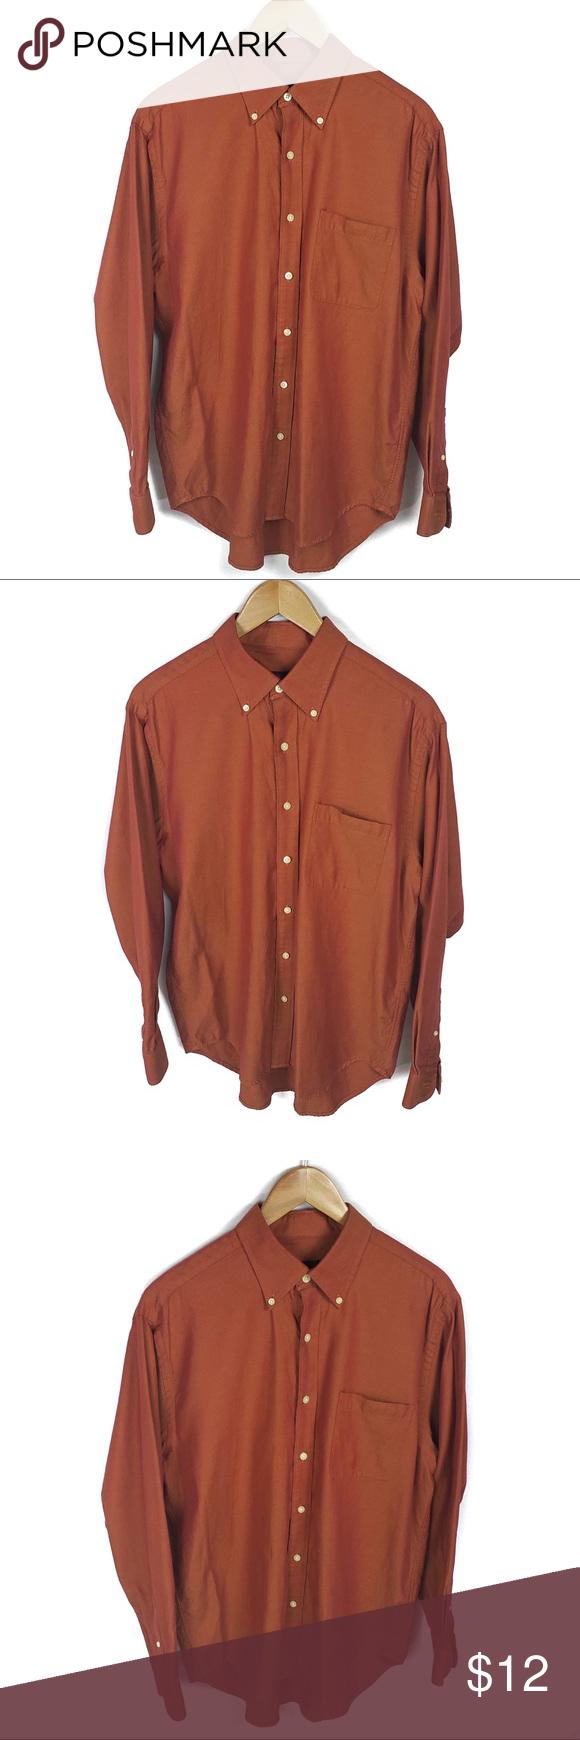 Austin Reed London Button Up Men S Large Austin Reed London Size Large Slight Iridescent Orange Color Euc Austin Ree Clothes Design Austin Reed Colorful Shirts